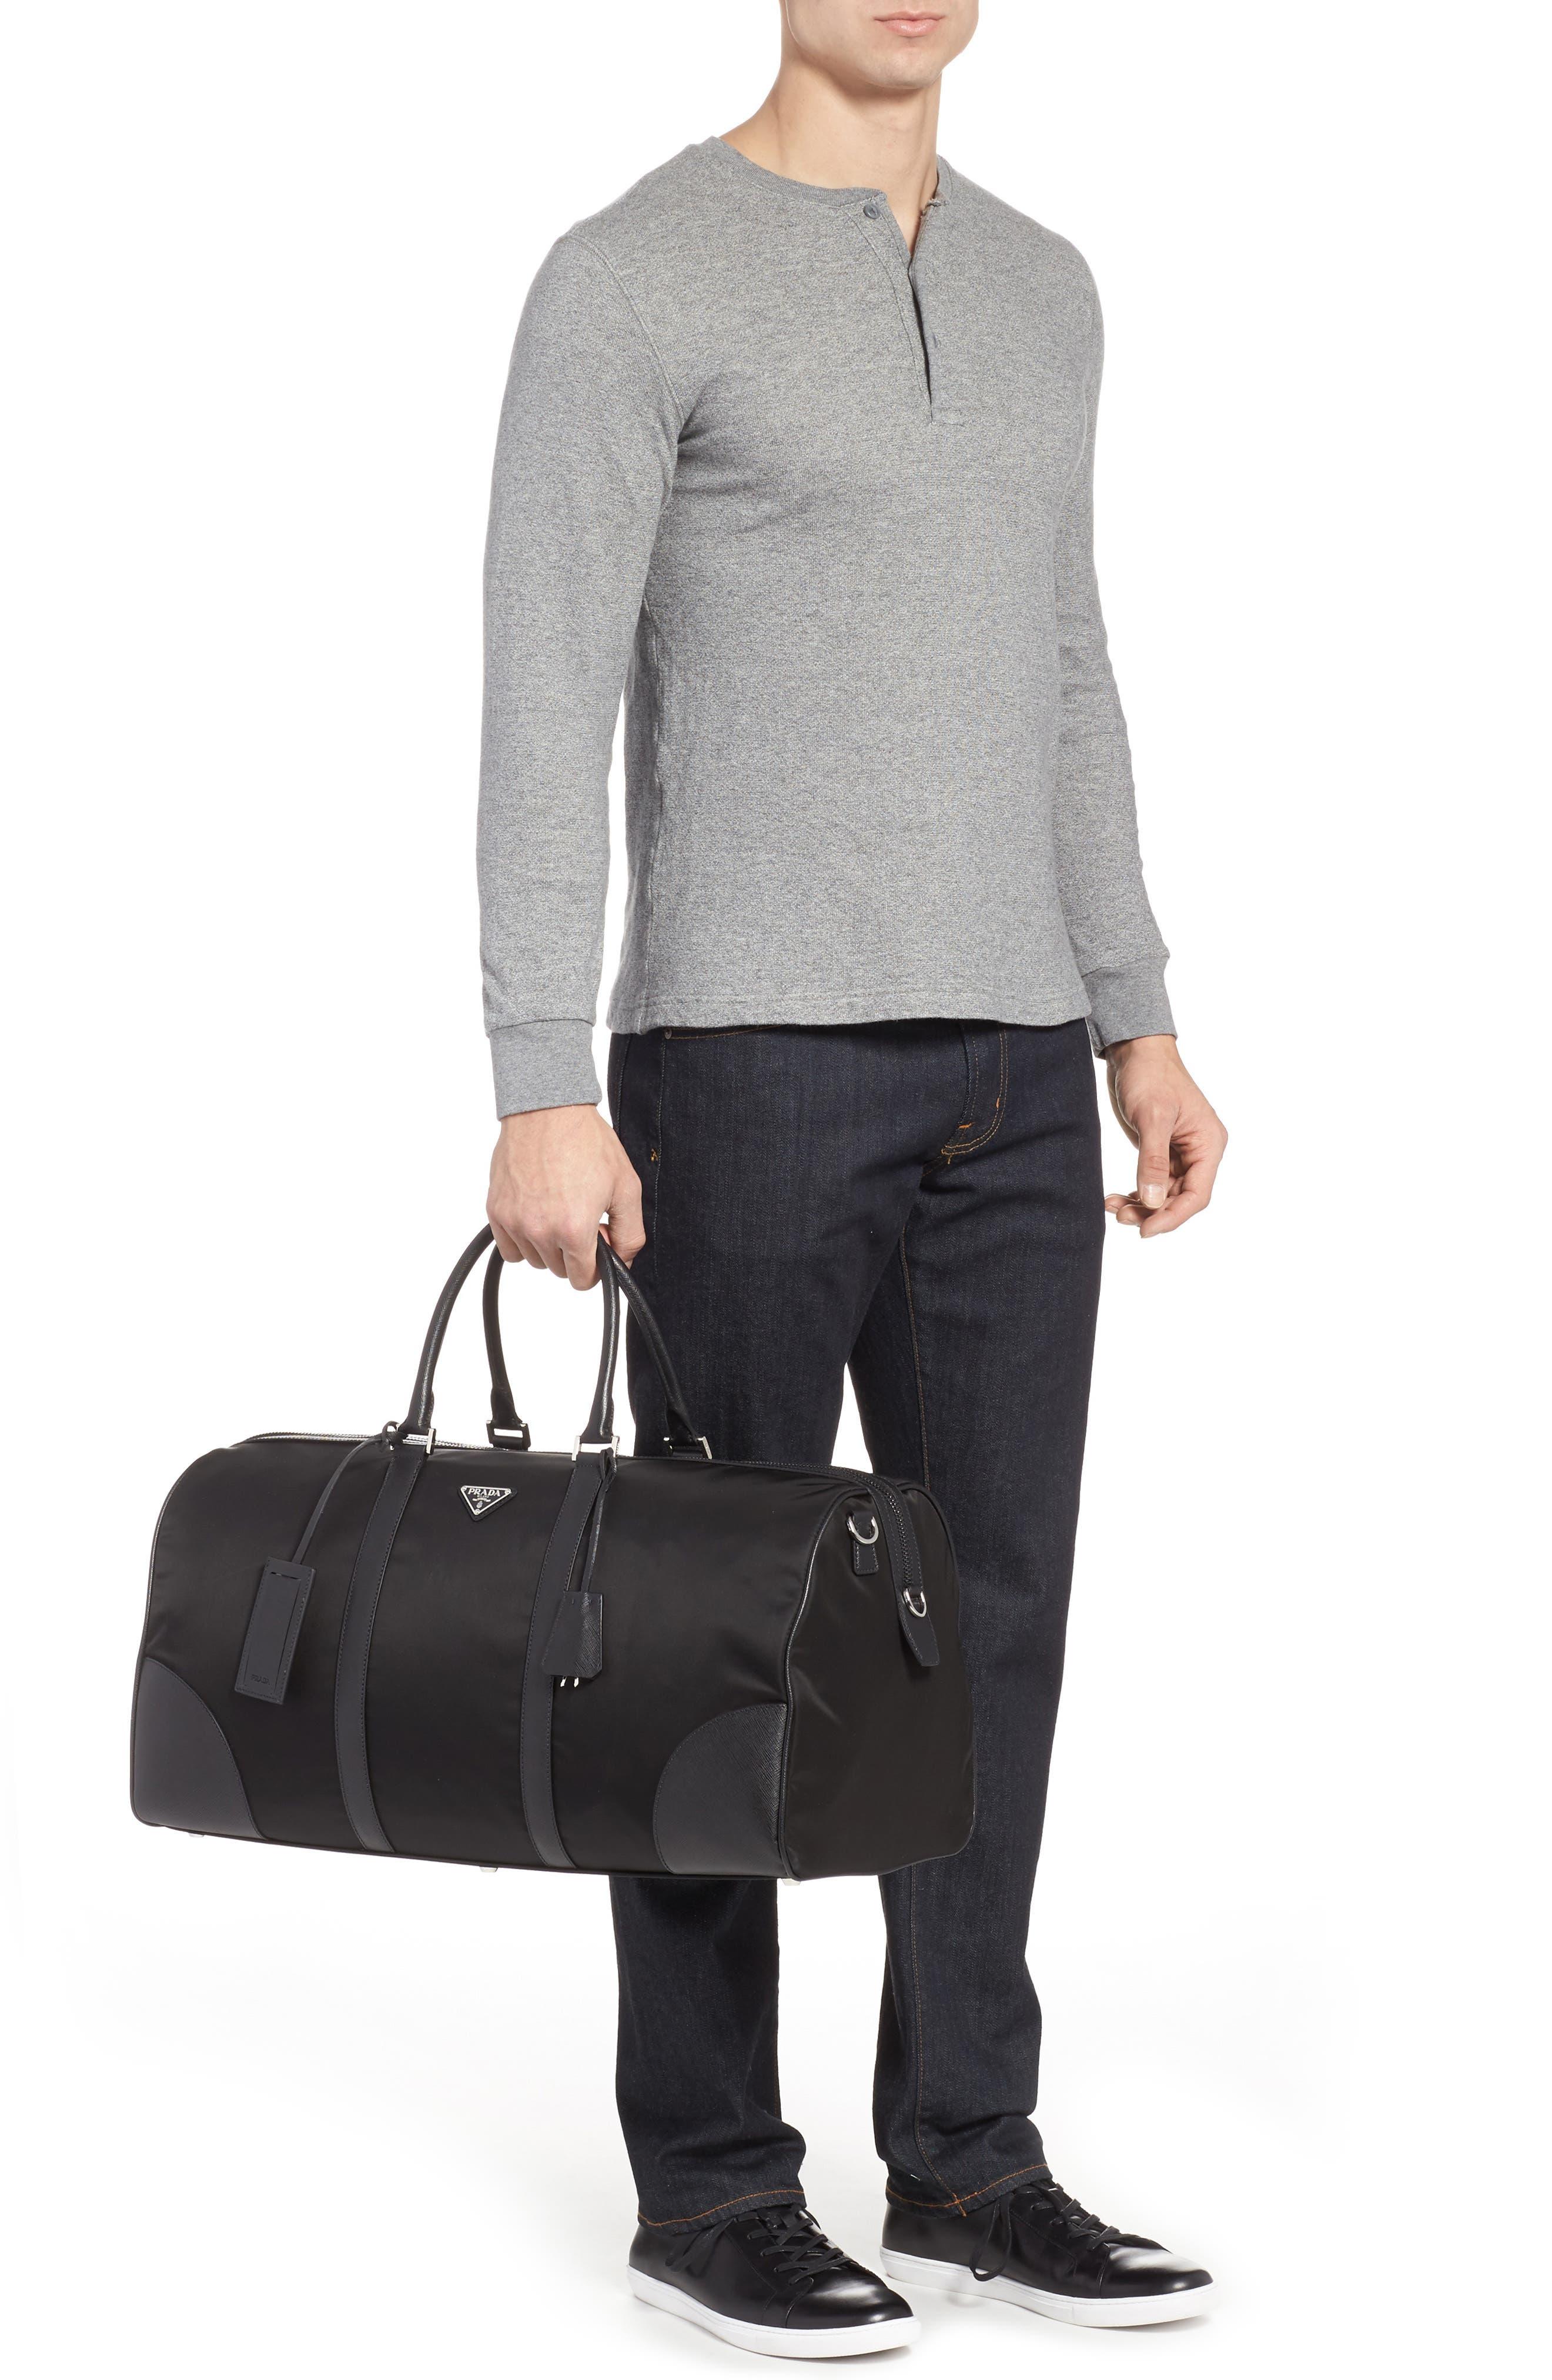 Nylon & Saffiano Leather Bowling Bag,                             Alternate thumbnail 2, color,                             001